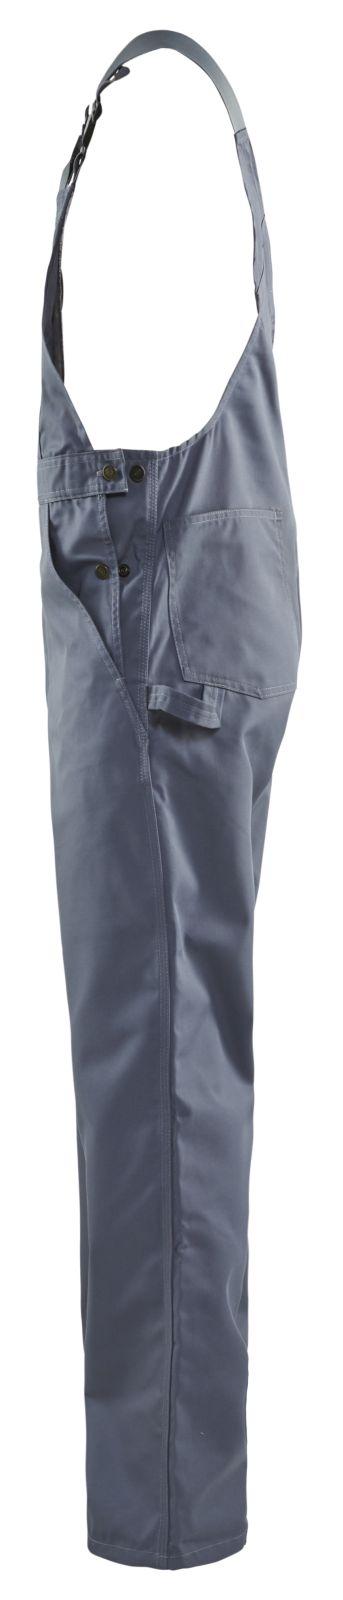 Blaklader Amerikaanse overalls 26101800 grijs(9400)